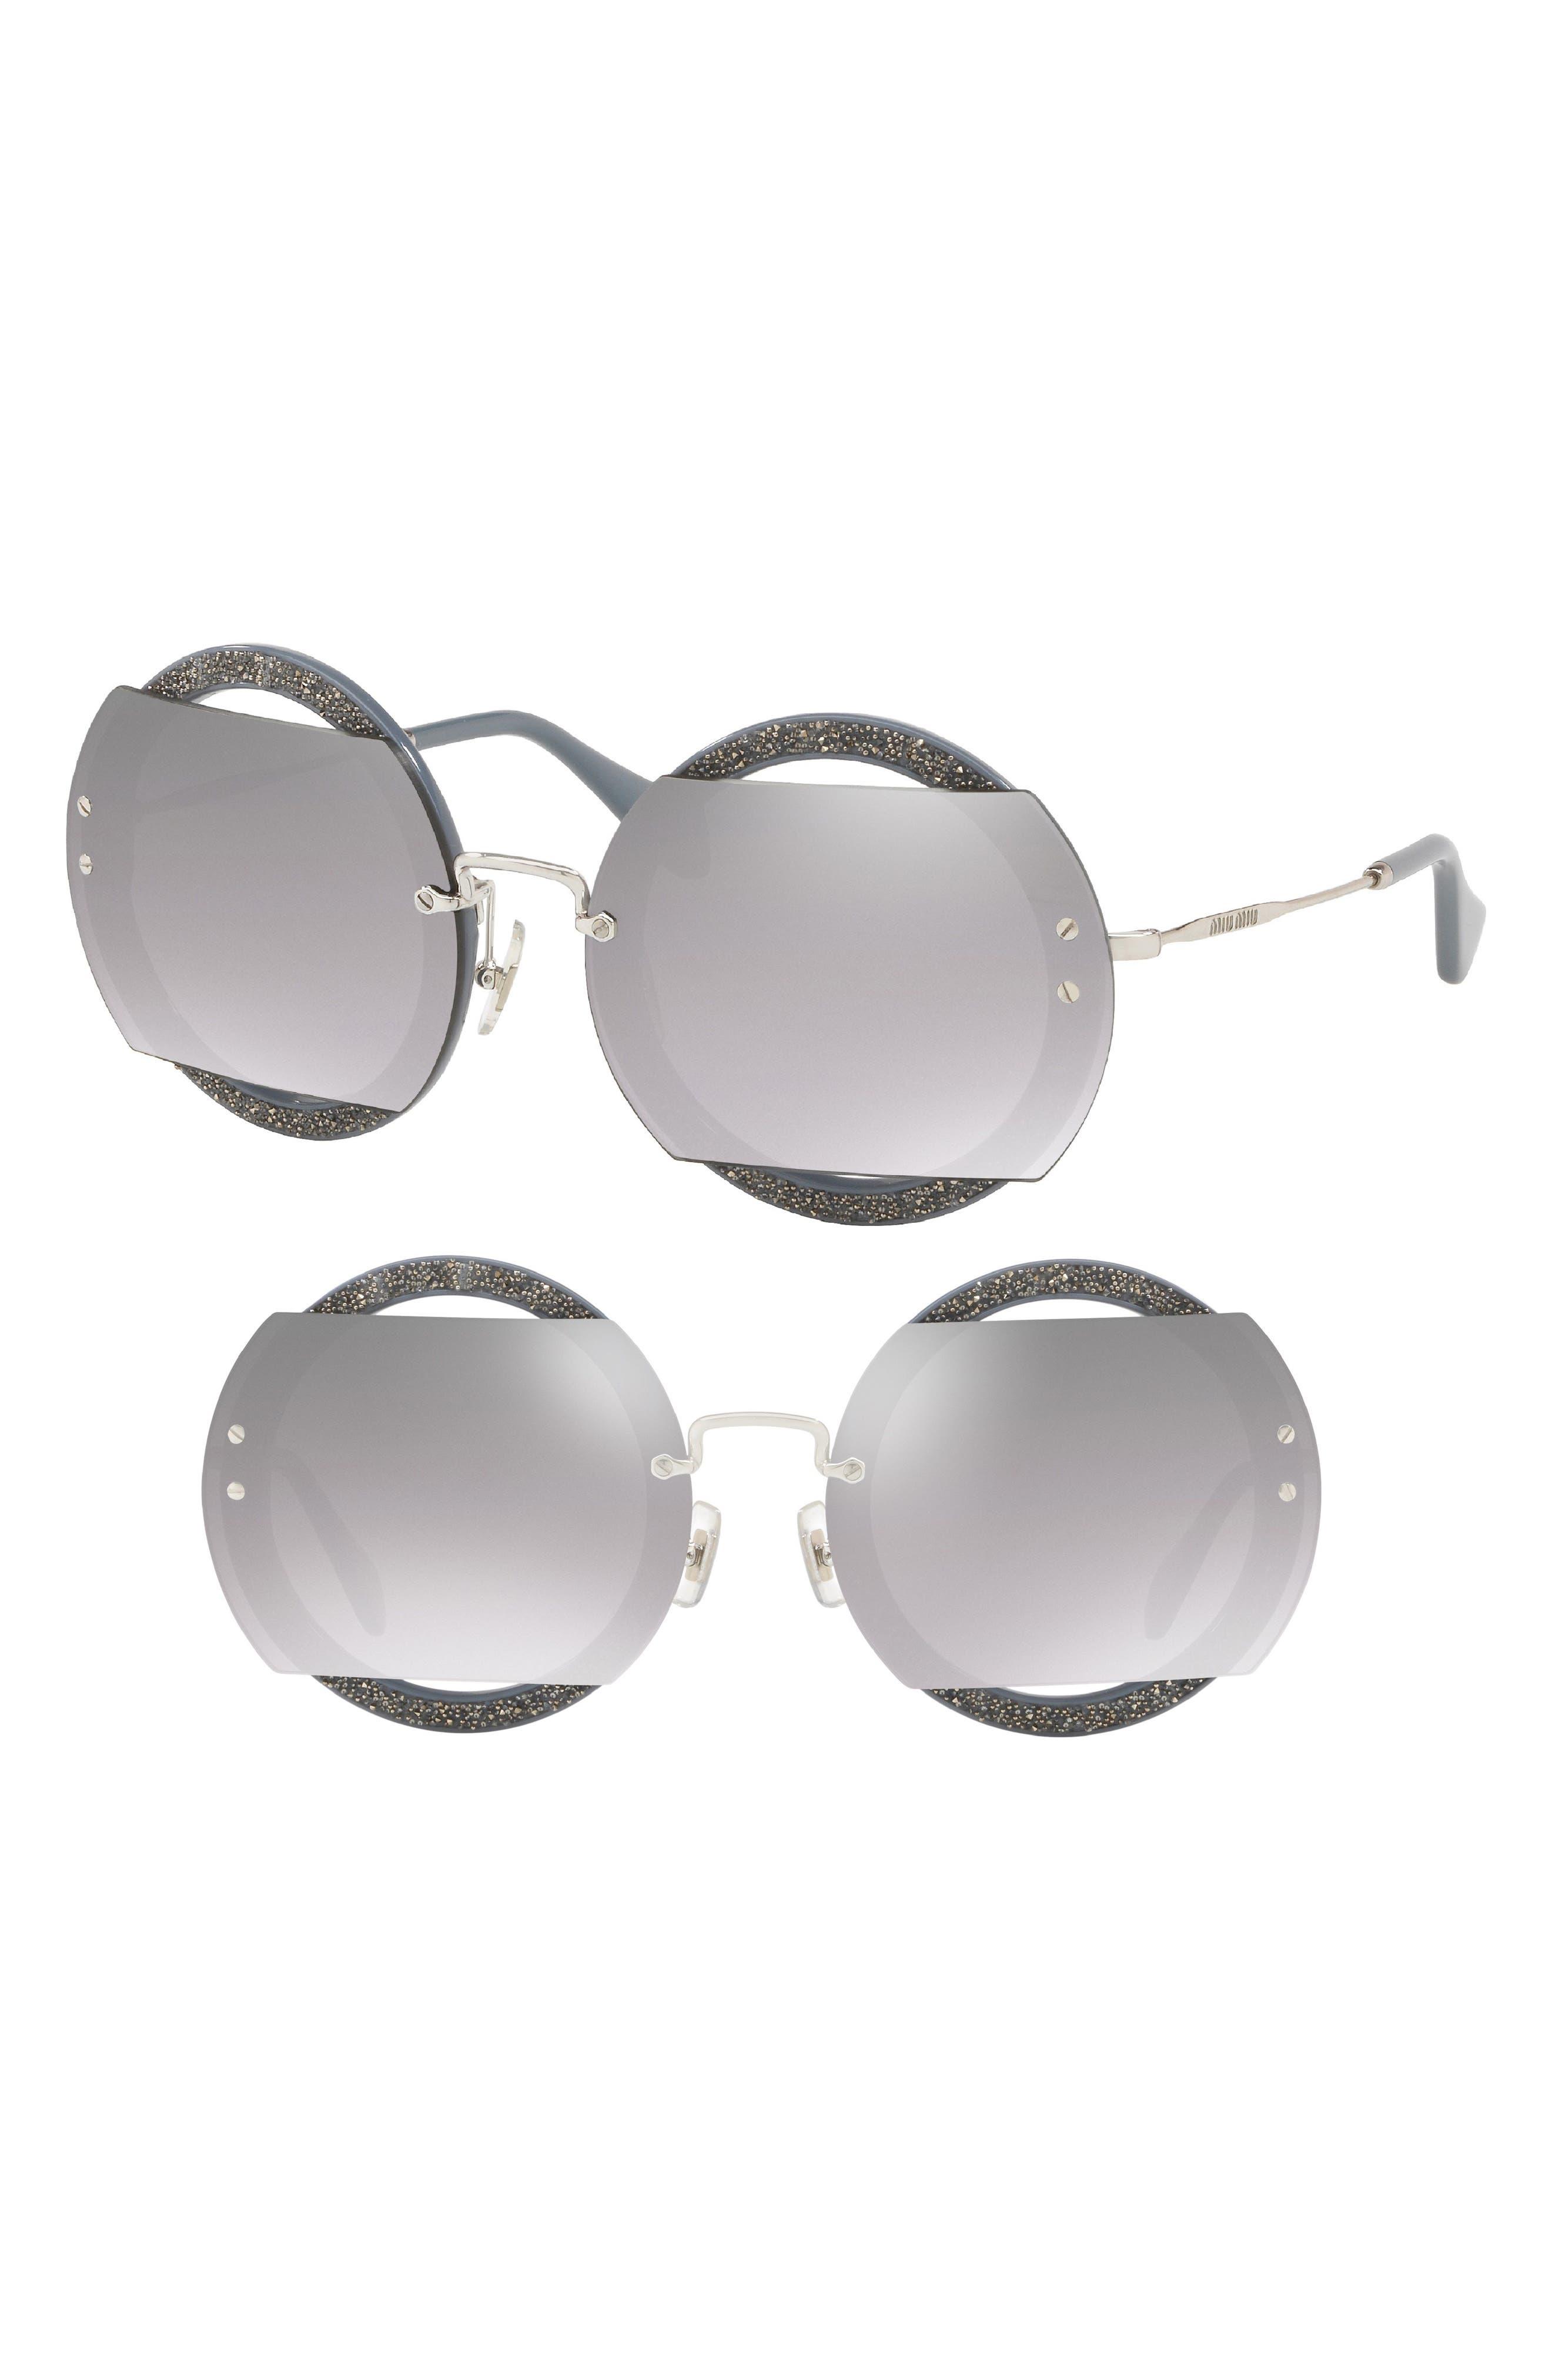 63mm Round Sunglasses,                             Main thumbnail 2, color,